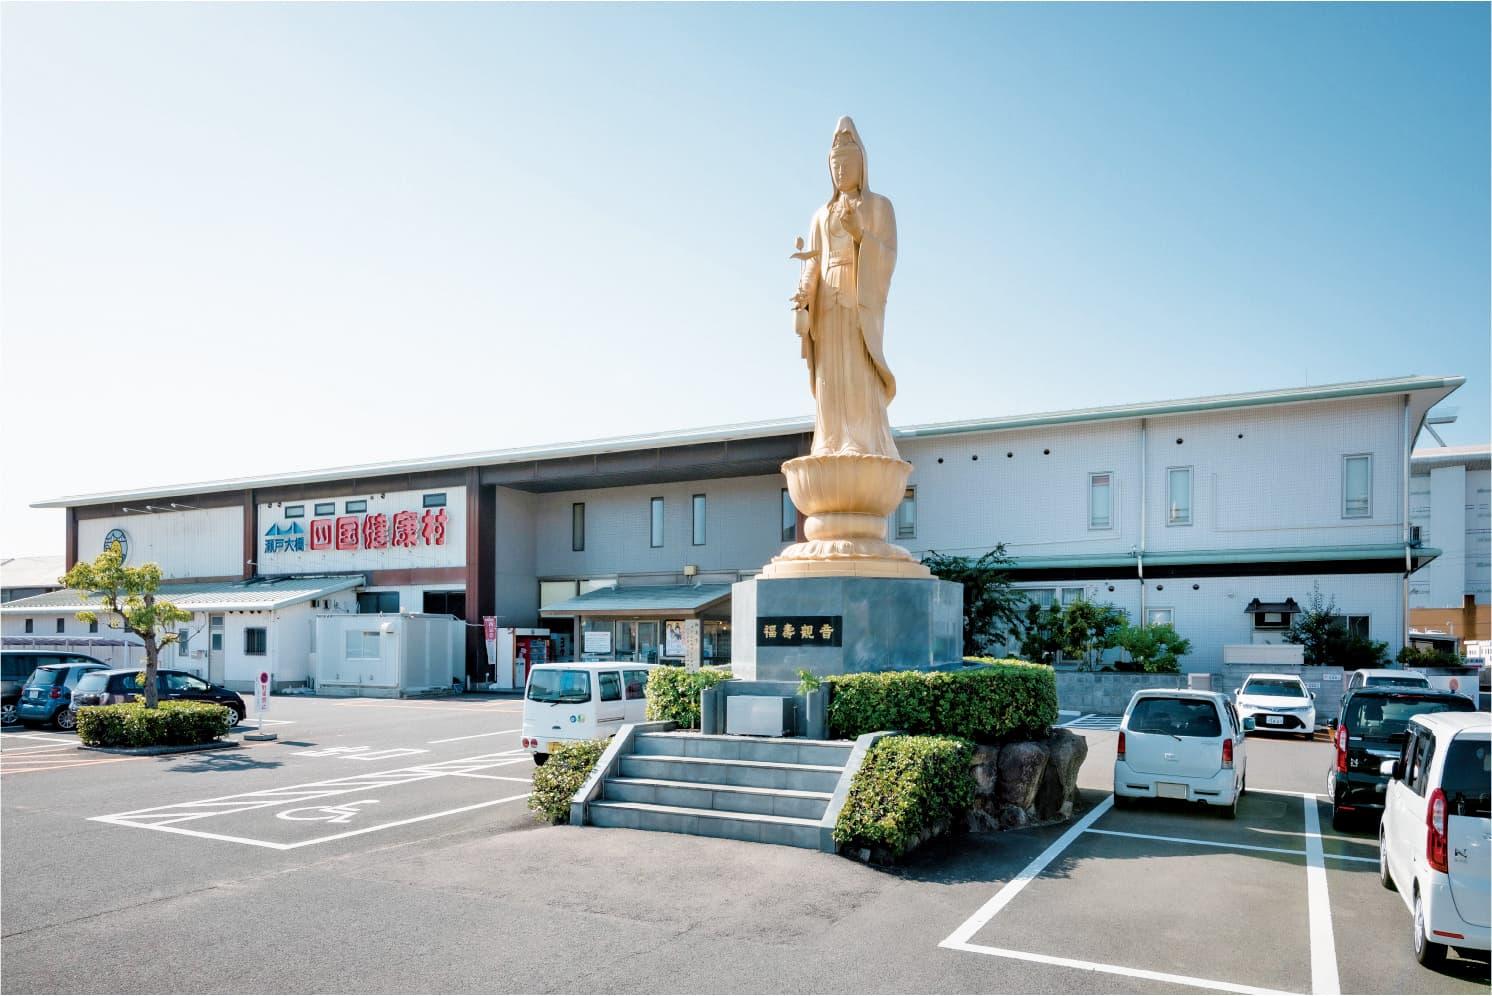 https://course-kagawa.com/wp-content/uploads/2021/03/2021四国健康村00005.jpg